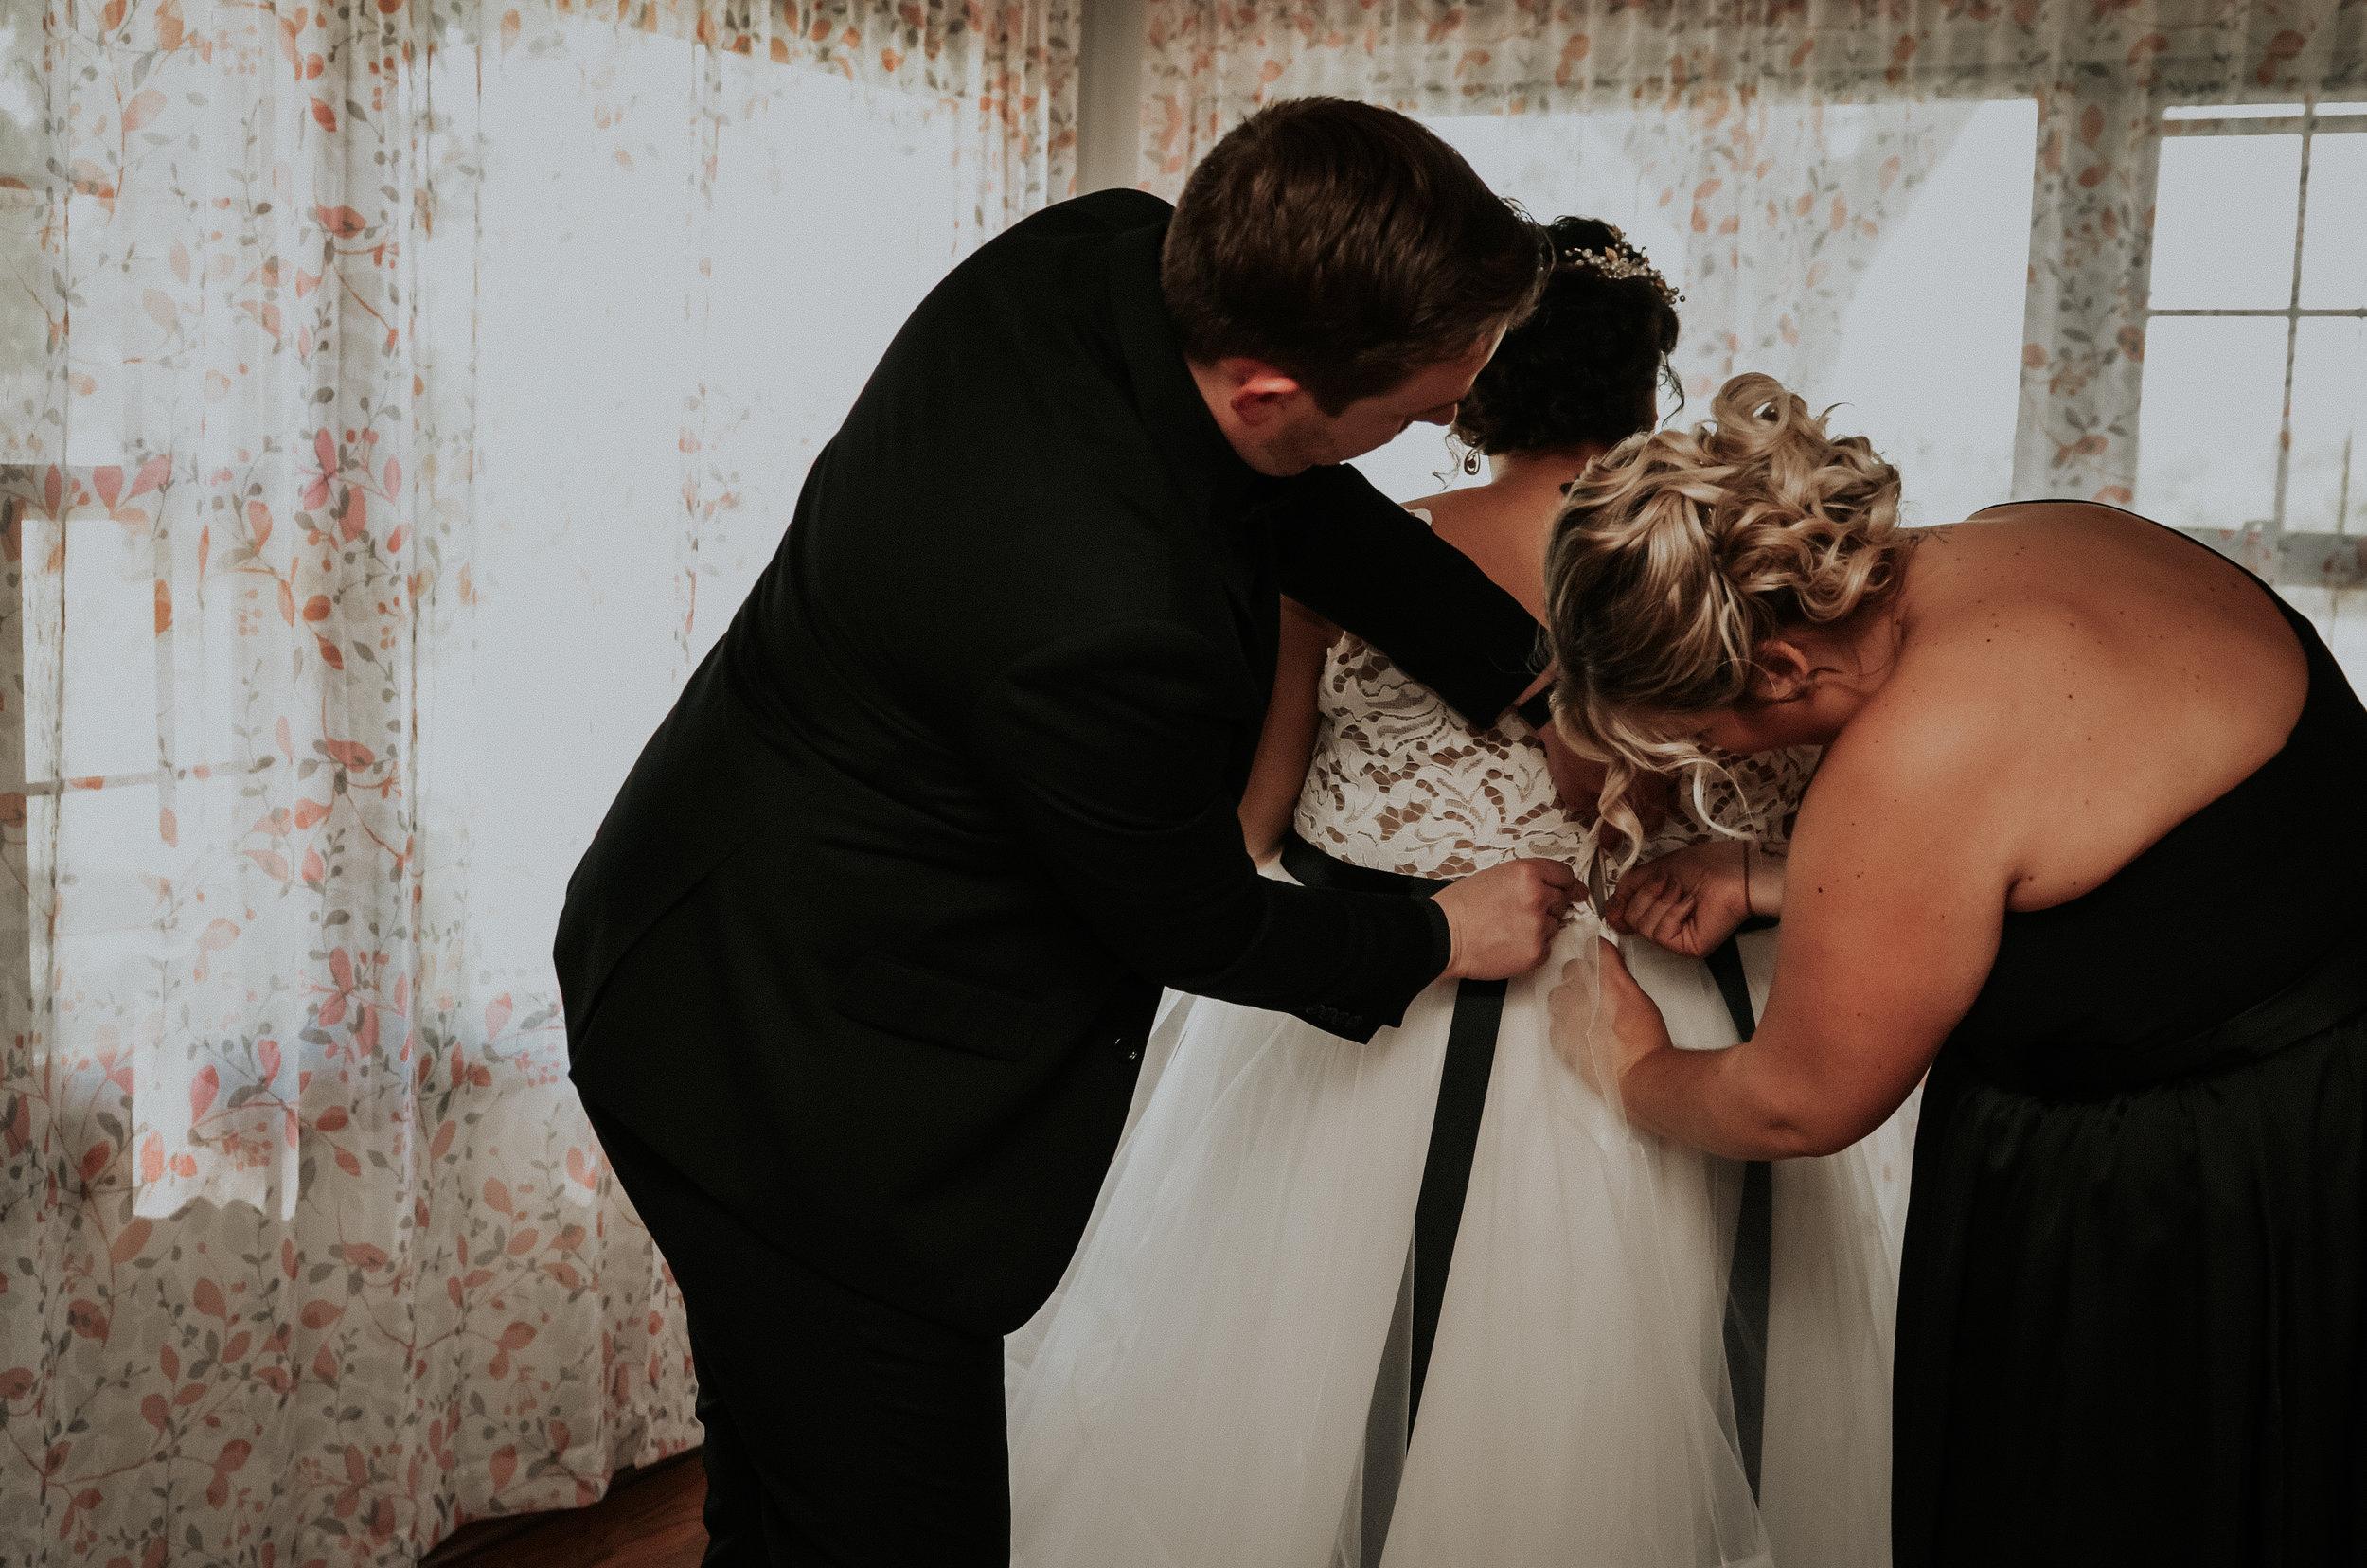 BridesbyYoung-RealWedding-PlusSizeBridal-BillyCourtney-JurassicParkTheme-4.jpg